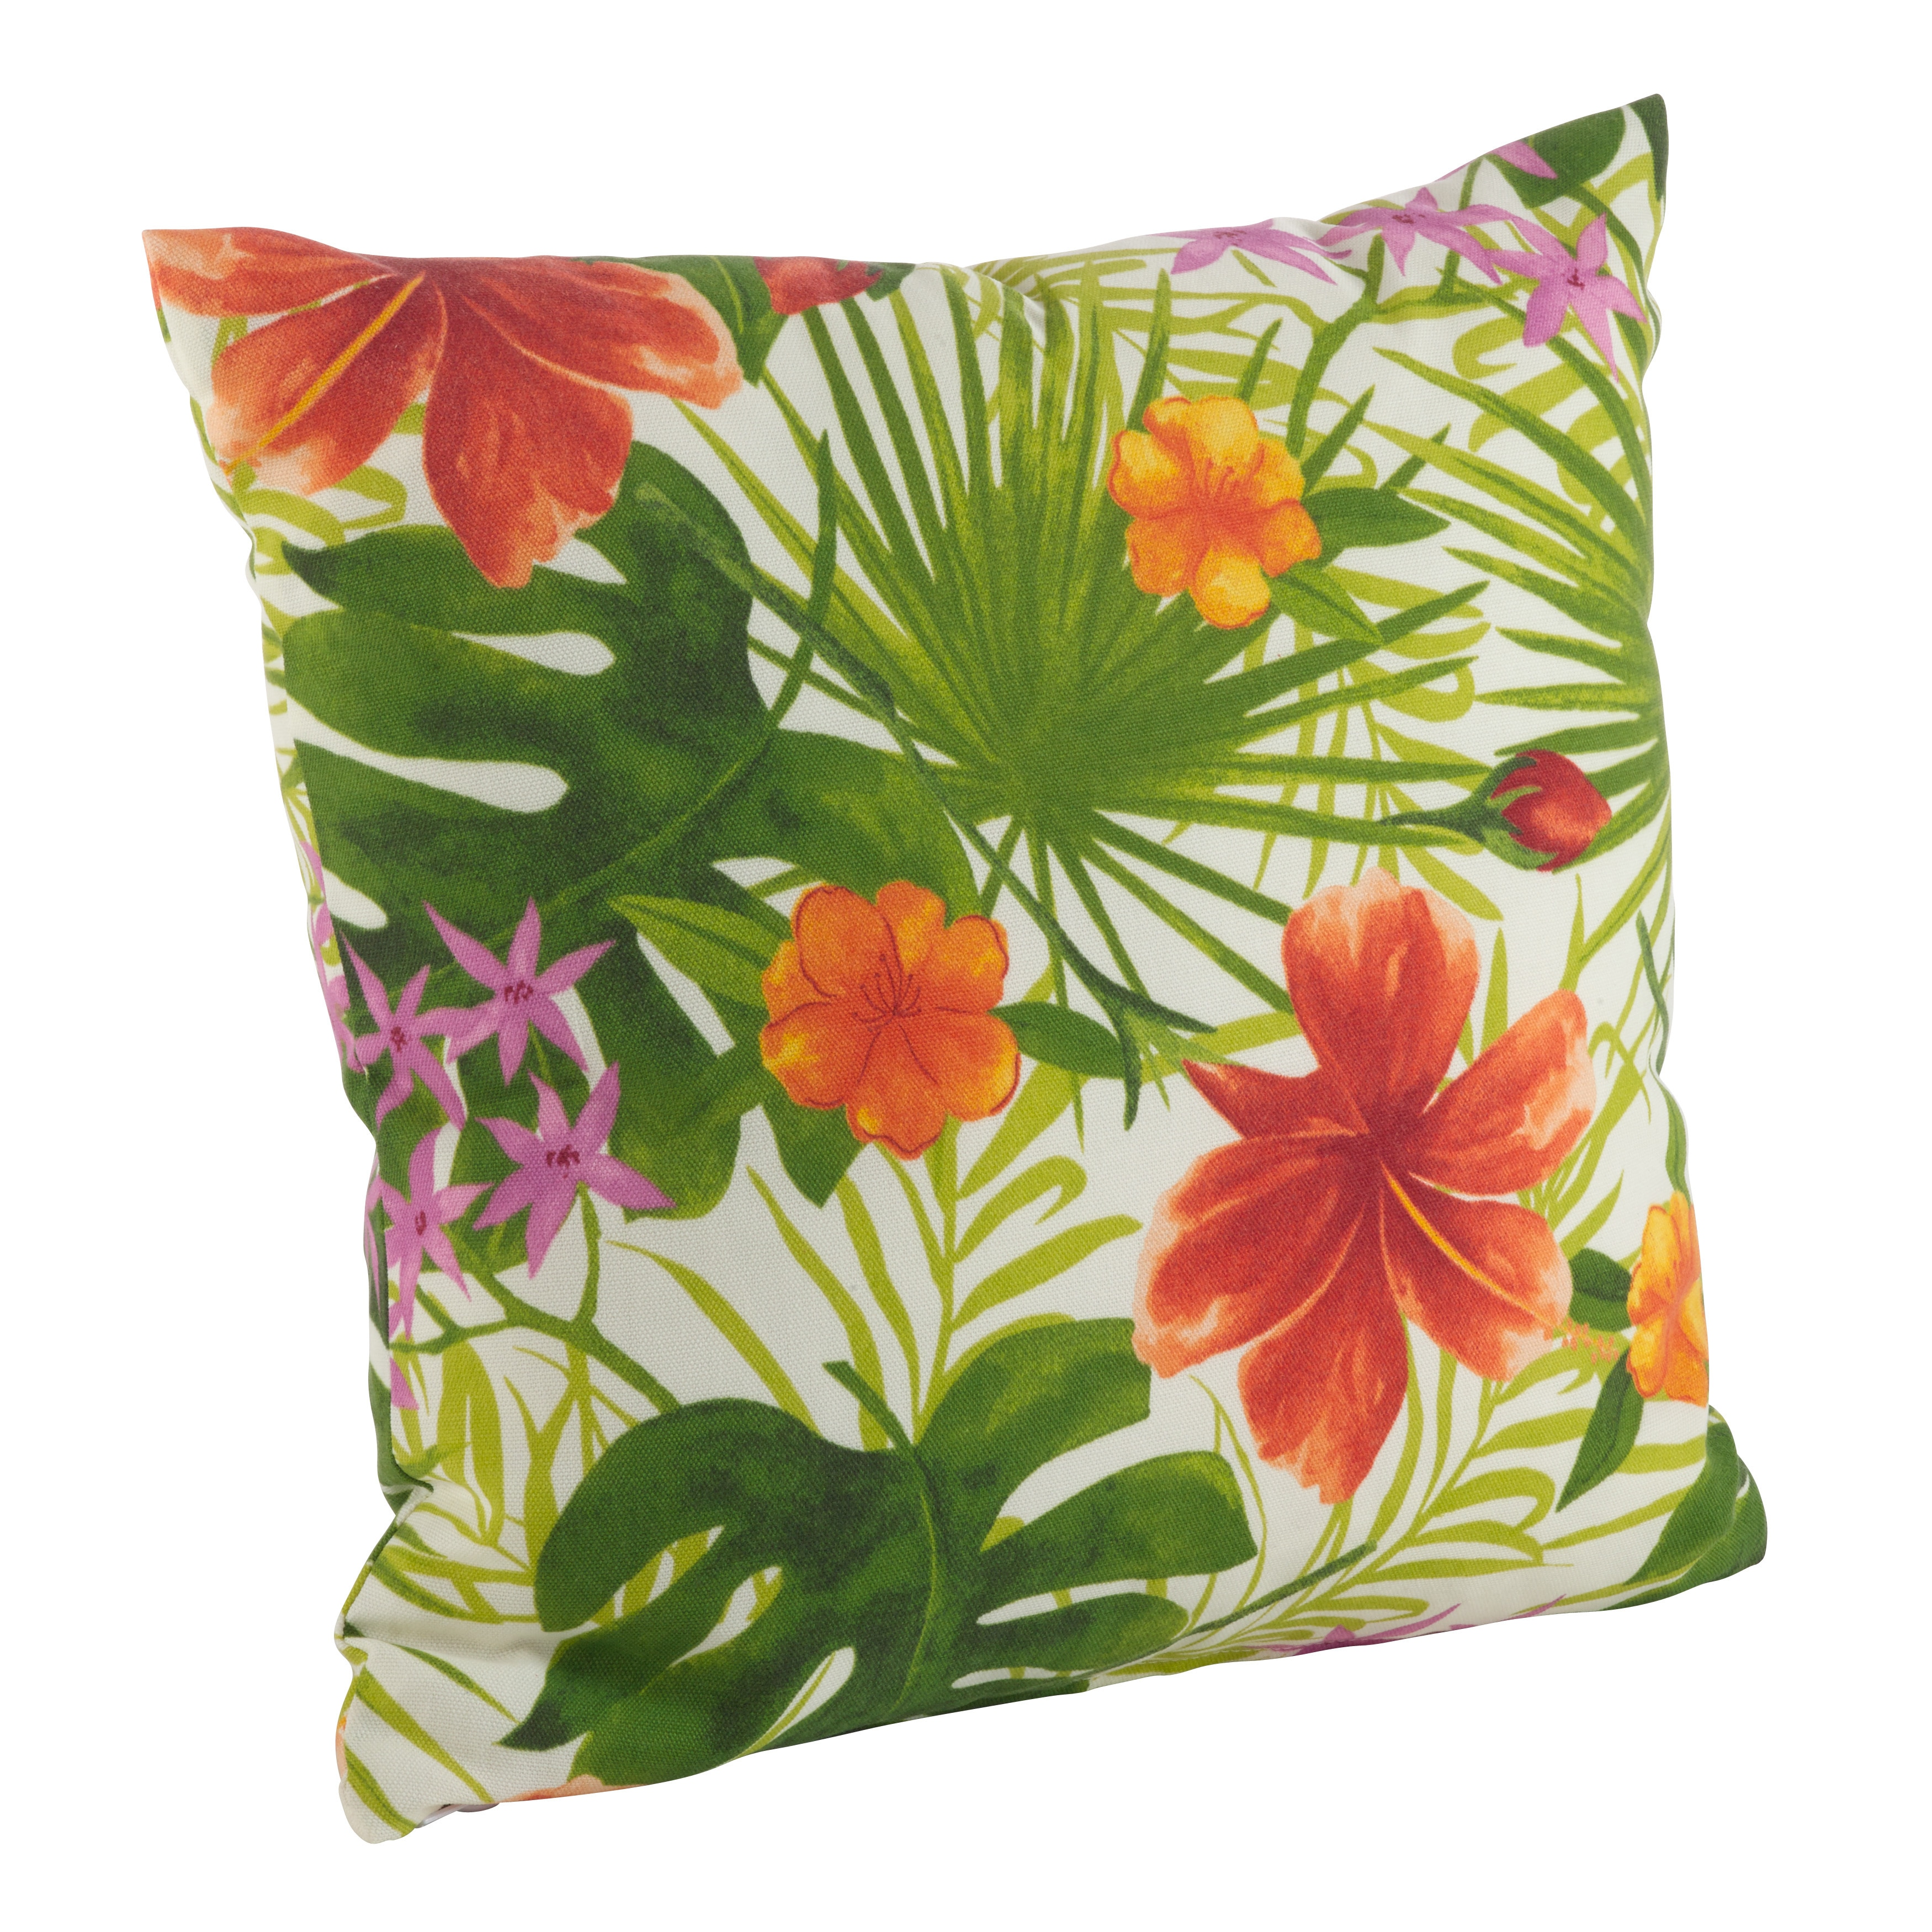 Shop Hibiscus Flower Print Indooroutdoor Poly Filled Throw Pillow